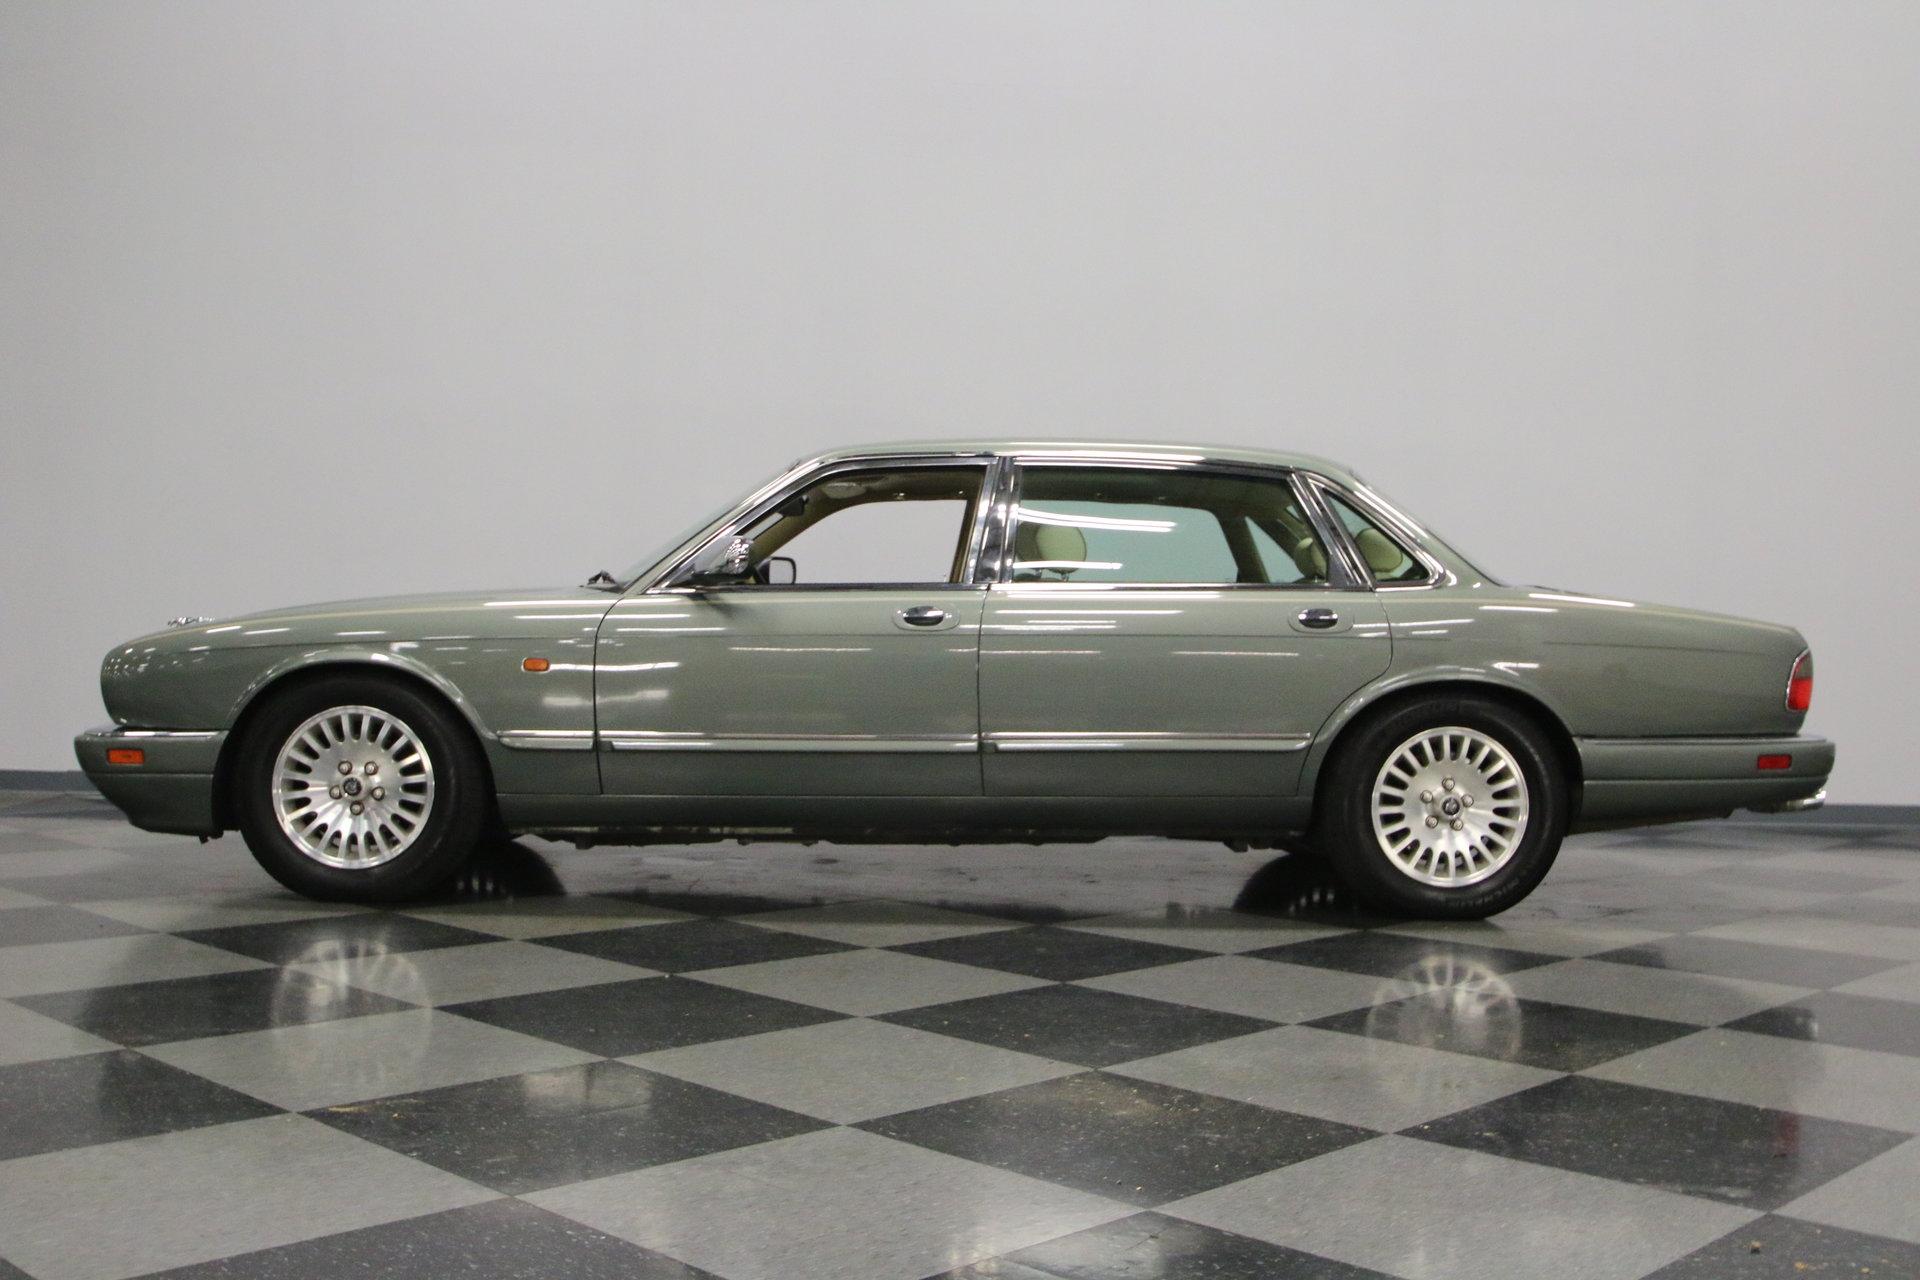 1996 Jaguar Xj Streetside Classics The Nations Trusted Classic Xj6 Vanden Plas Show More Photos